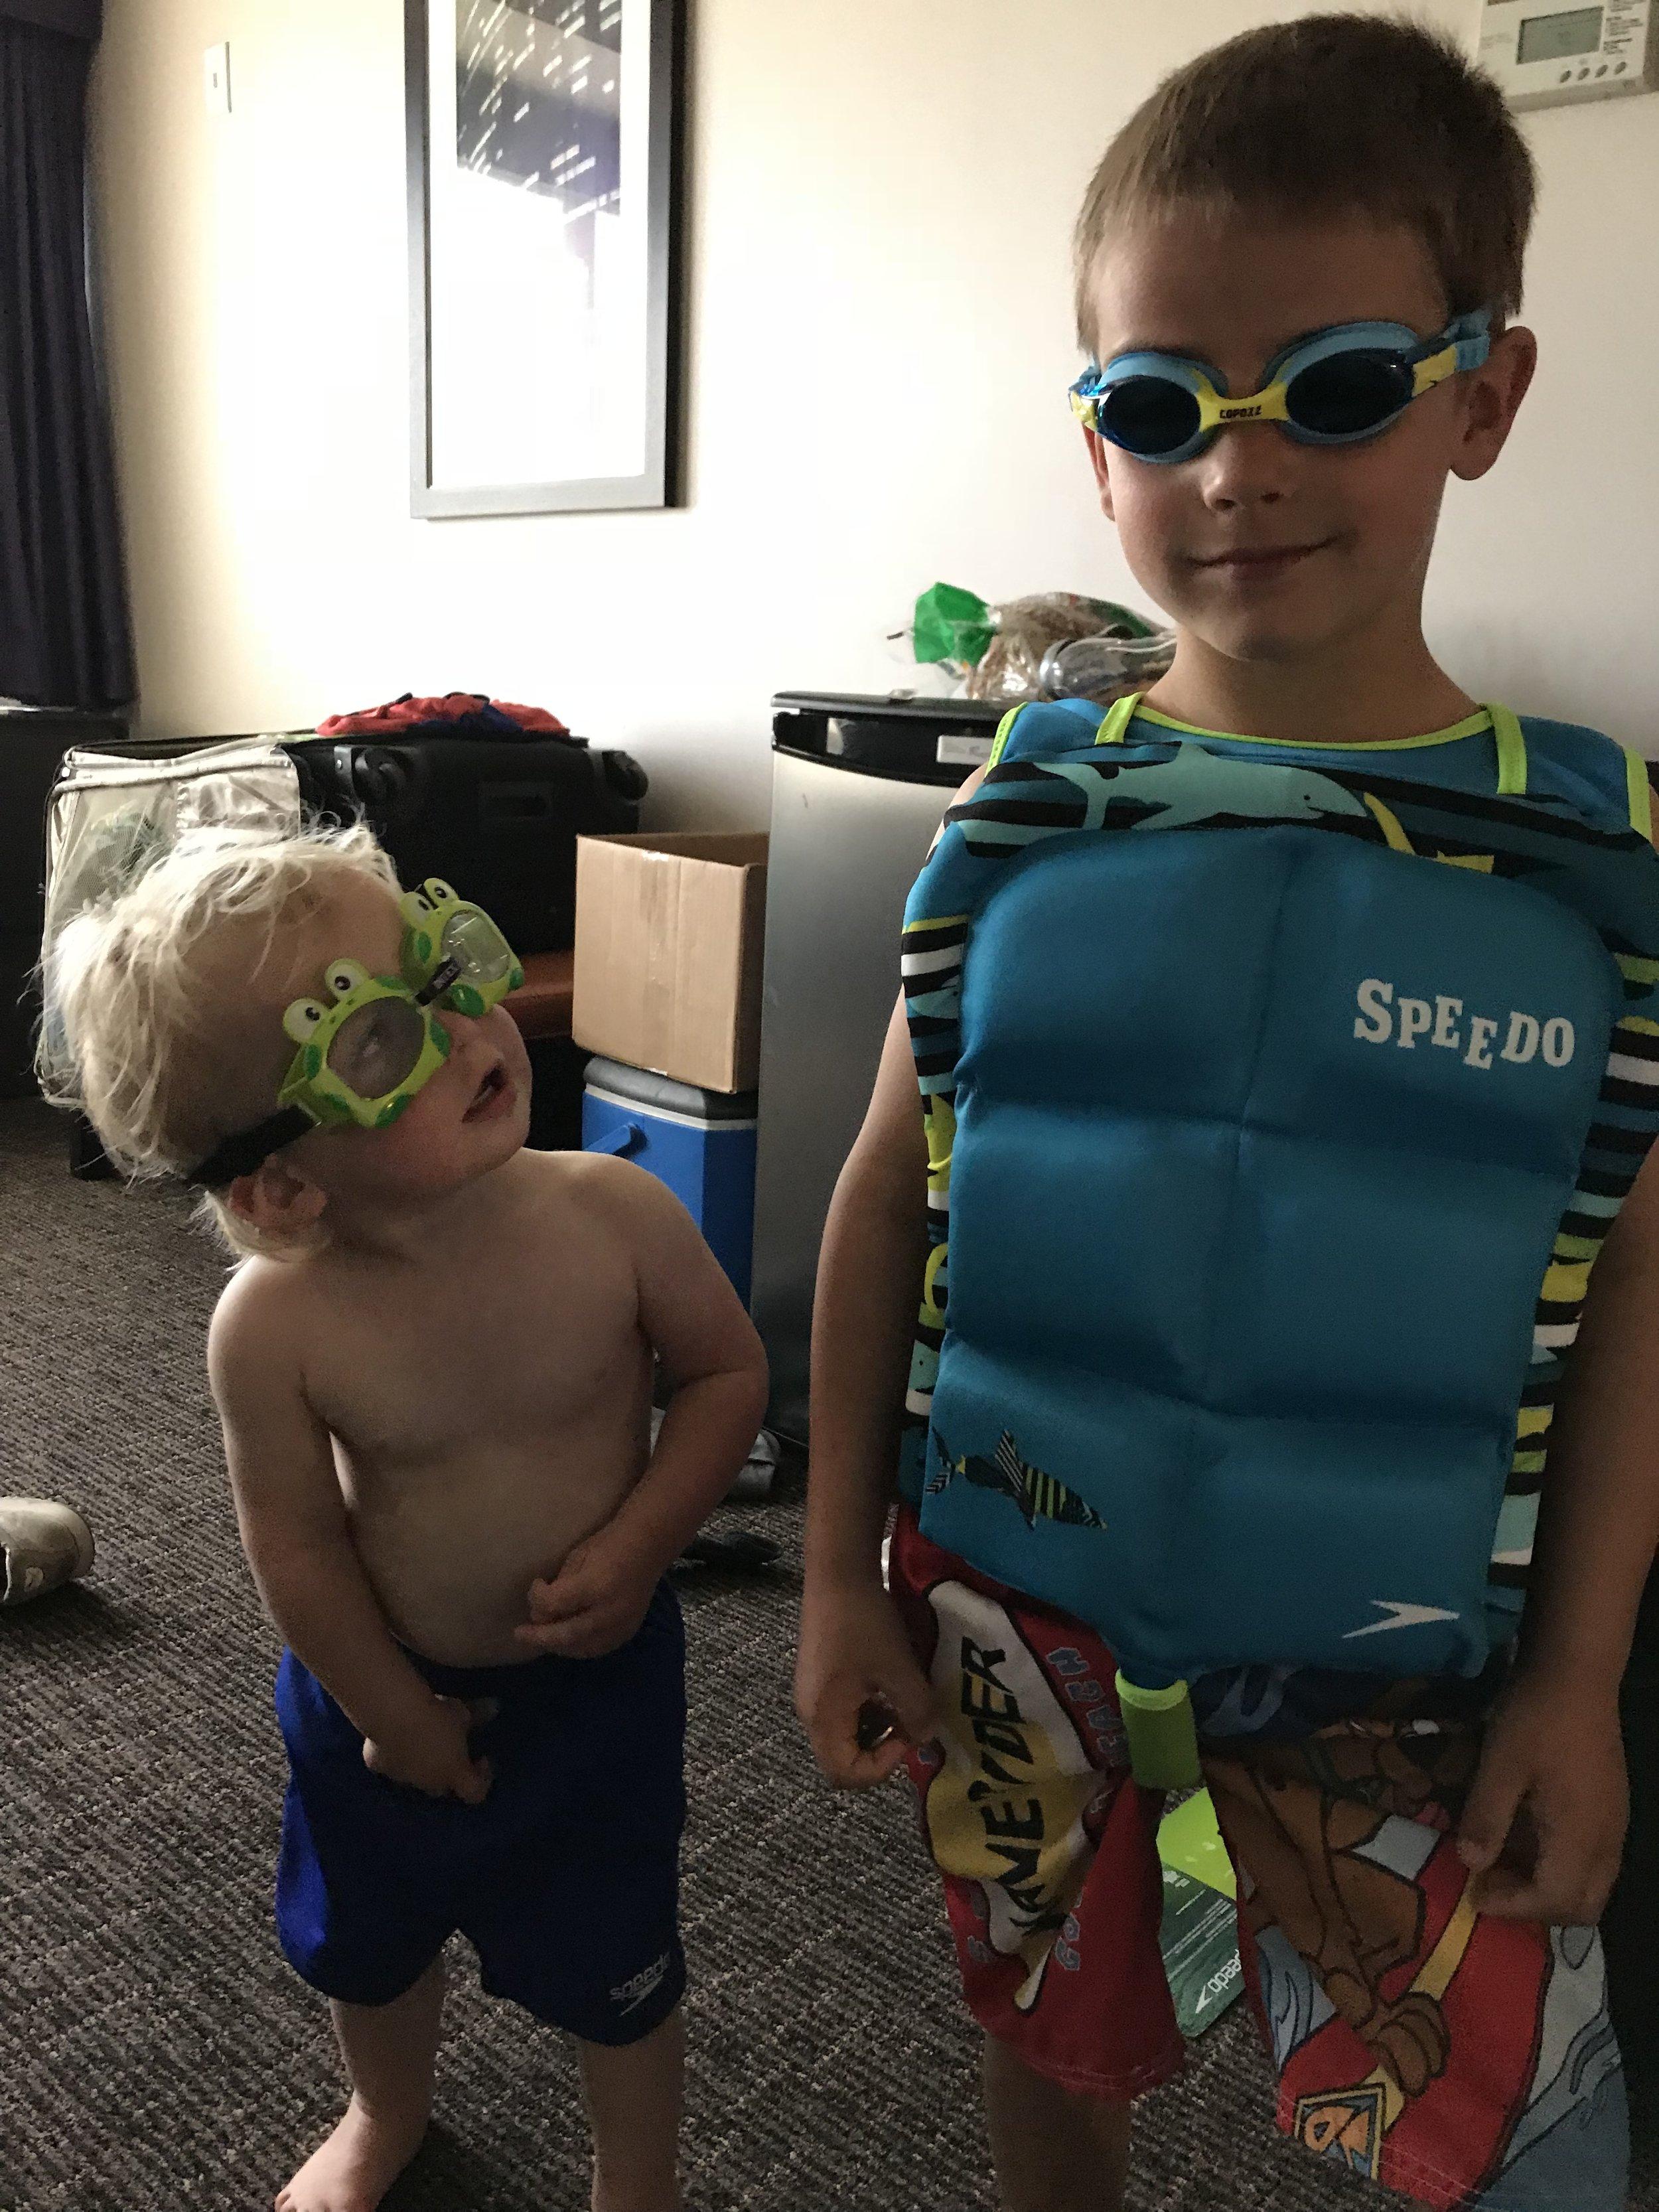 Swim bros   Chicago, IL   April